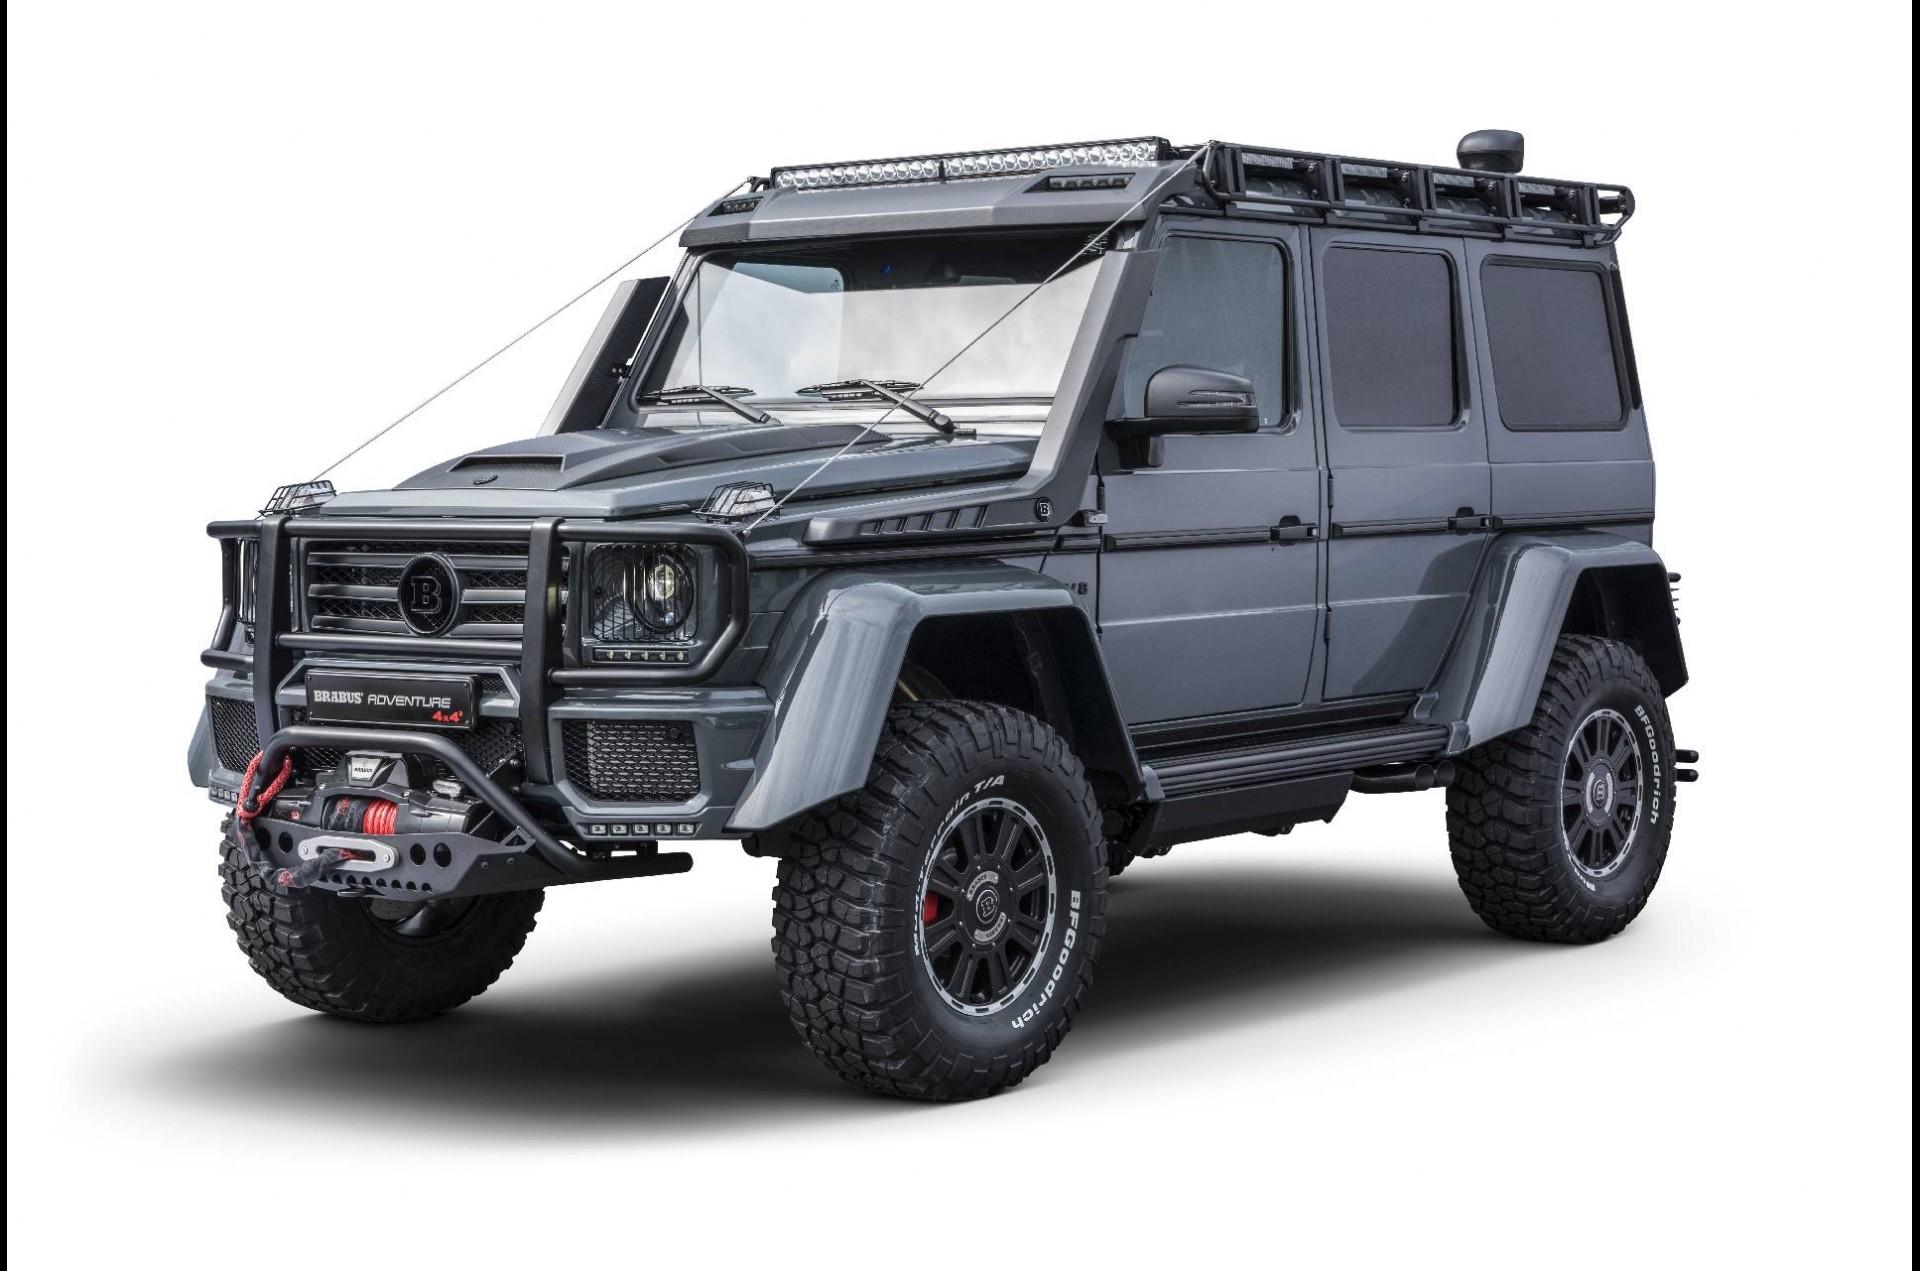 Brabus Adventure 4x4², la Mercedes pronta per l'apocalisse